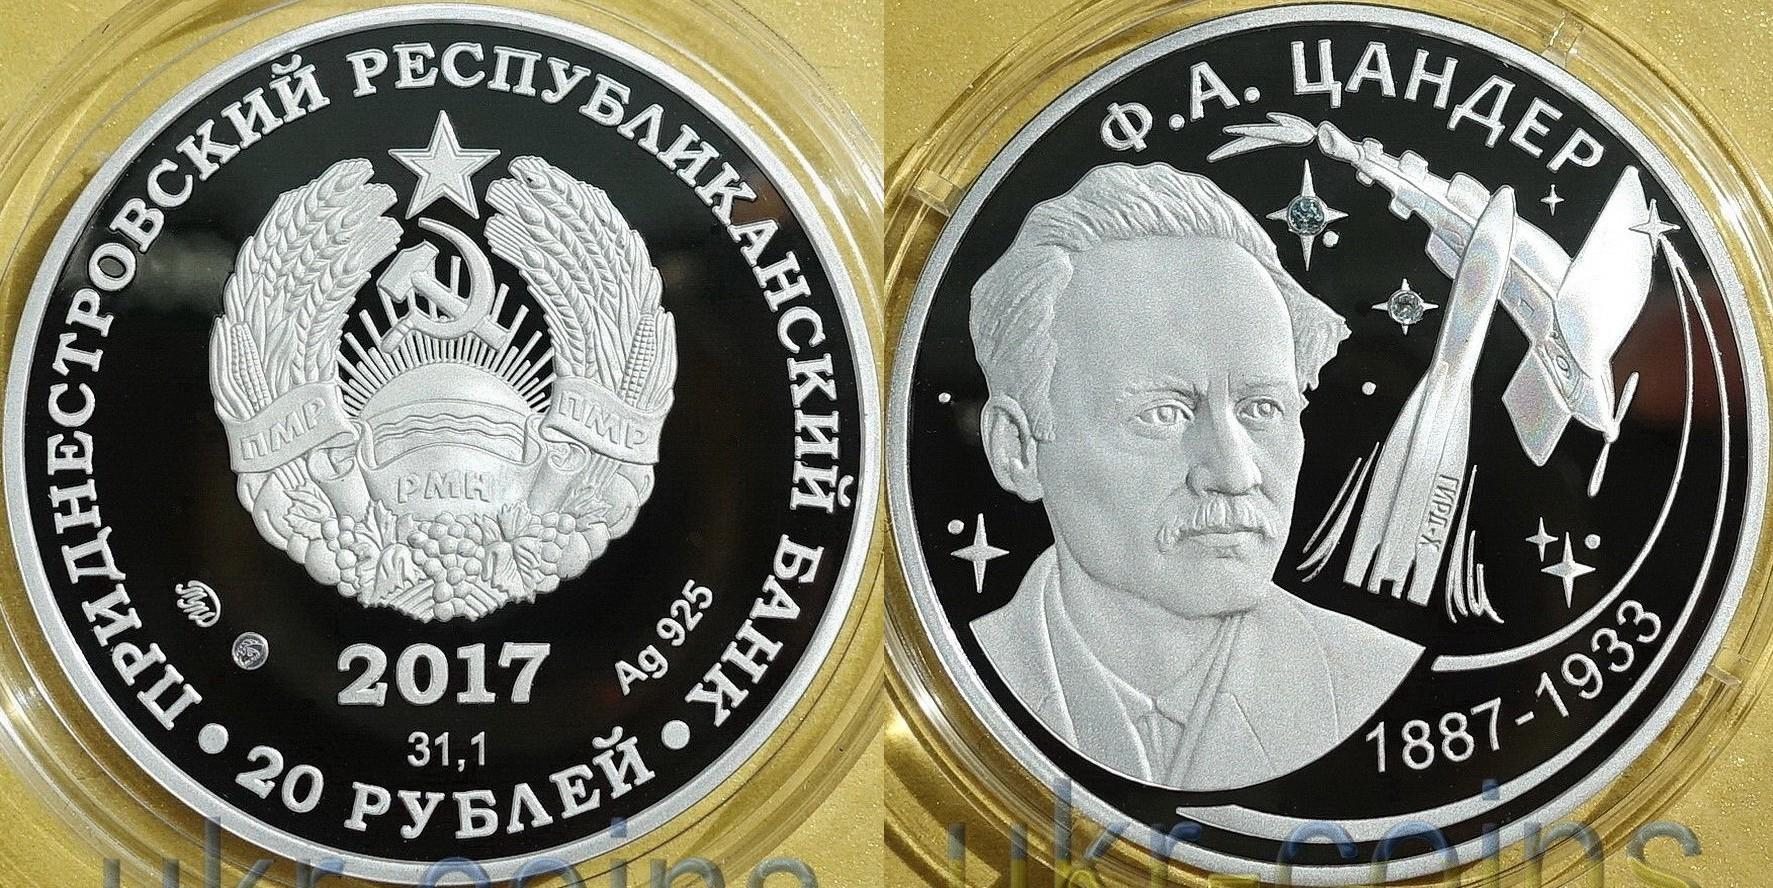 transnistrie 2017 zander